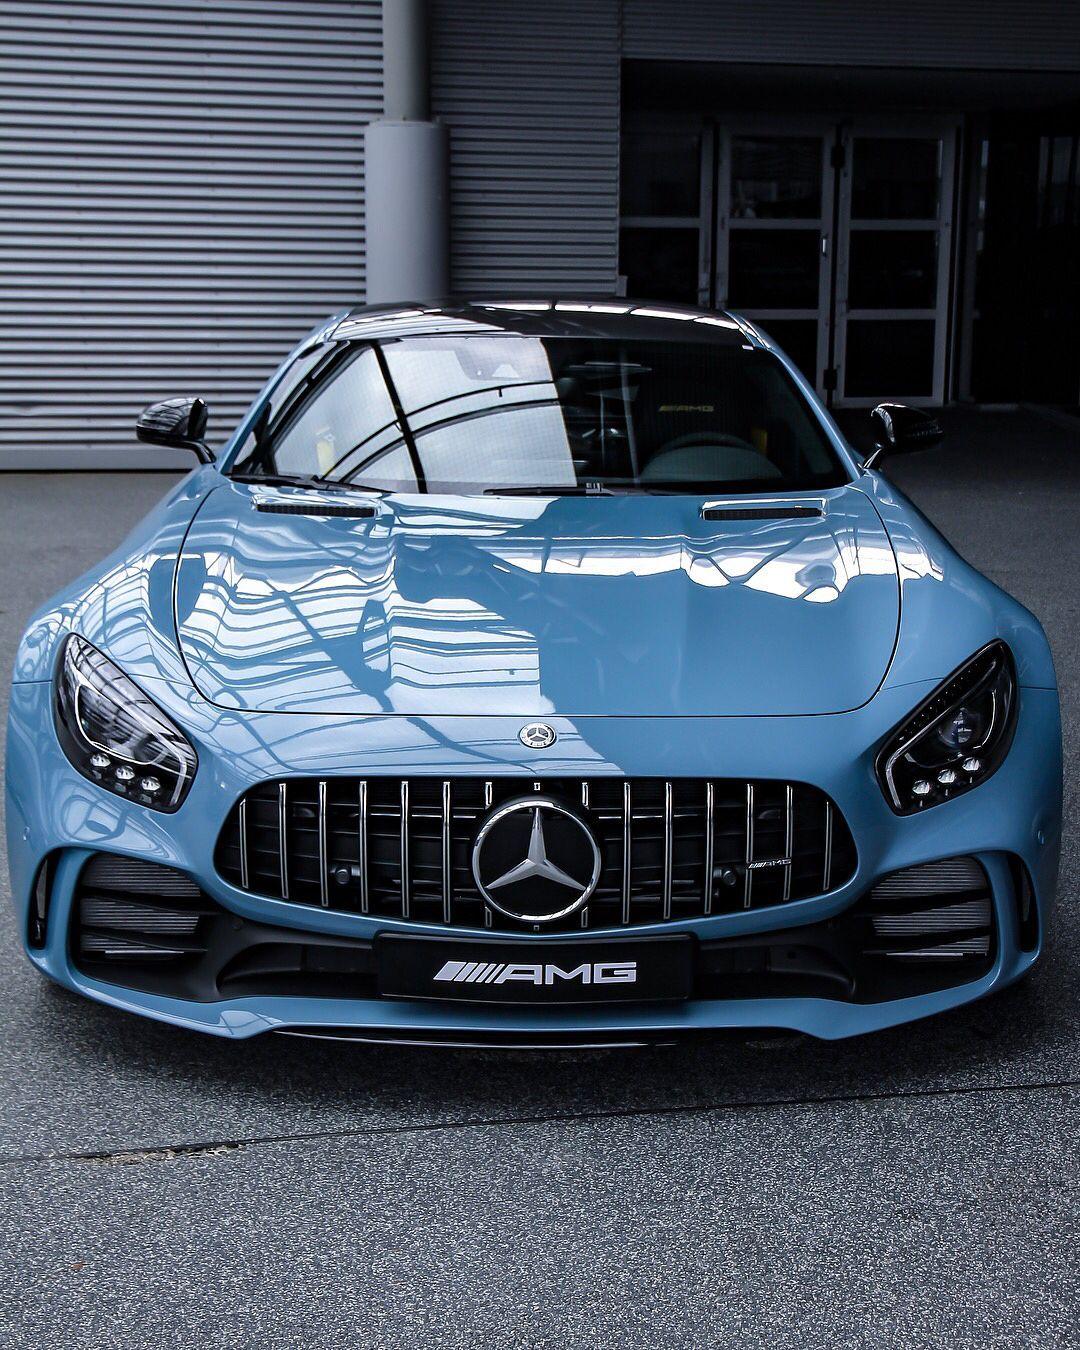 Best 4 Door Sports Cars In The World Best Pictures Cars Mercedes Benz Amg Mercedes Amg Mercedes Car